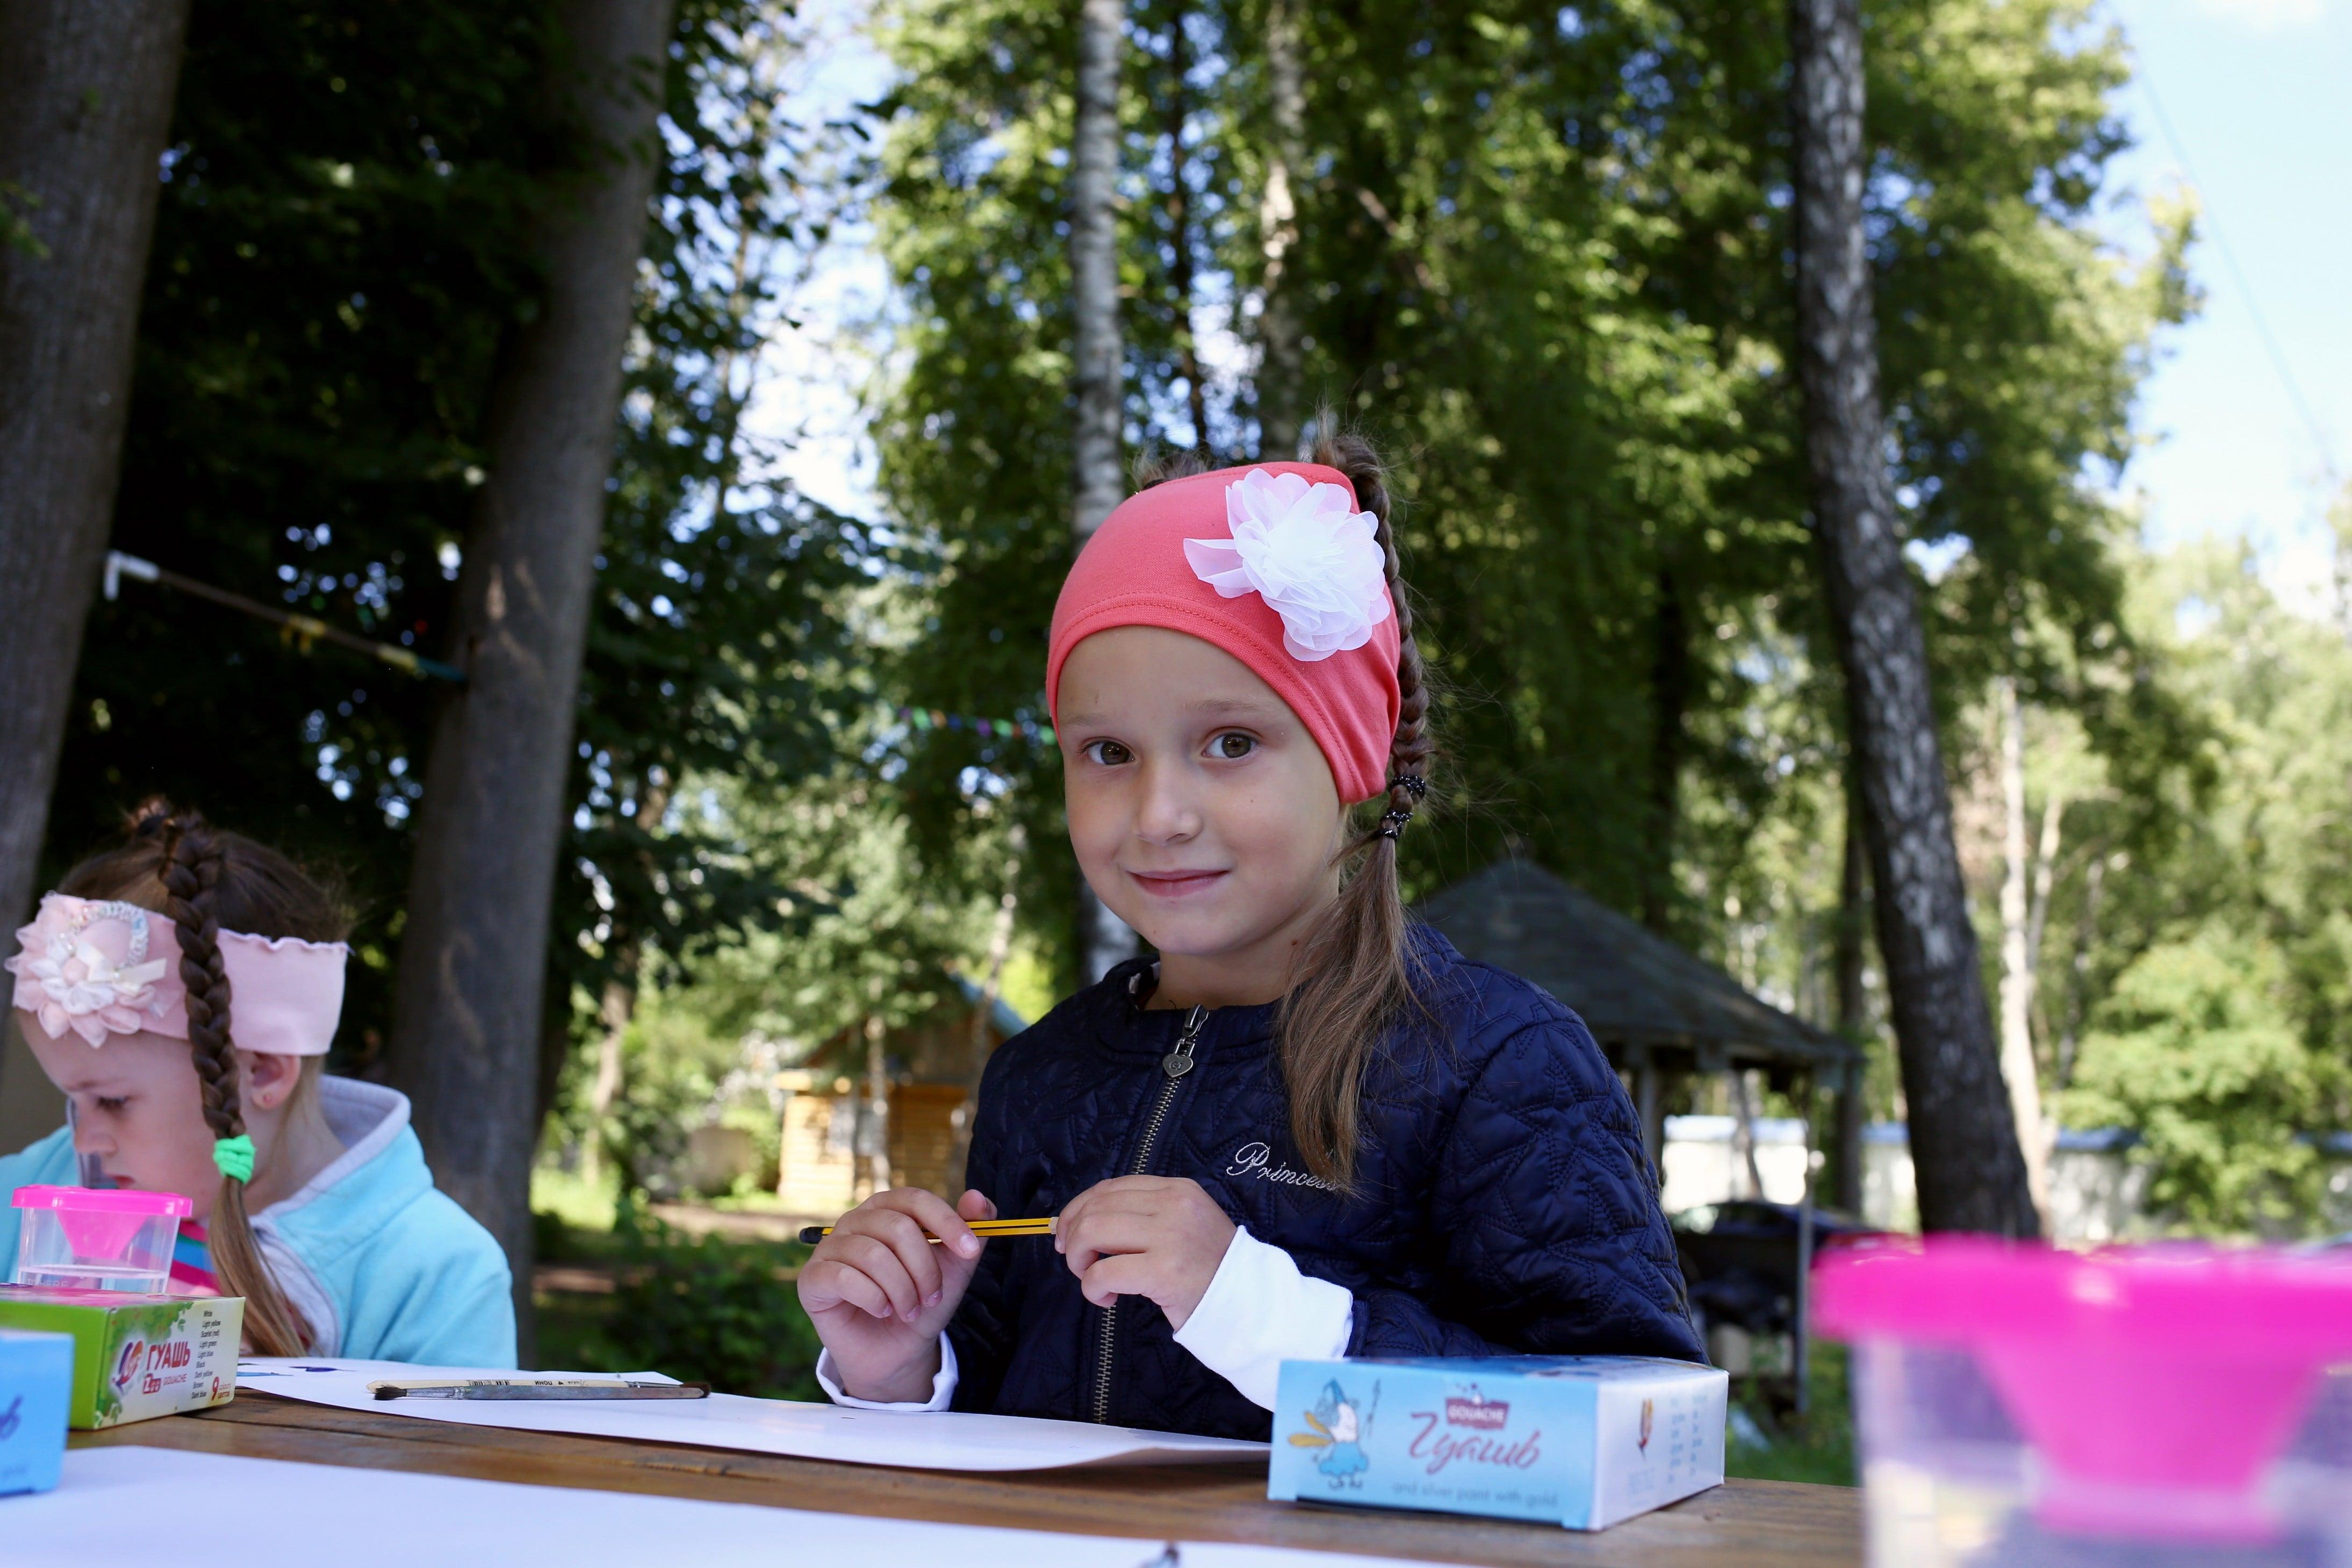 http://monuspen.ru/photoreports/14b72a43bf568736ebc953d1a903f310.jpg